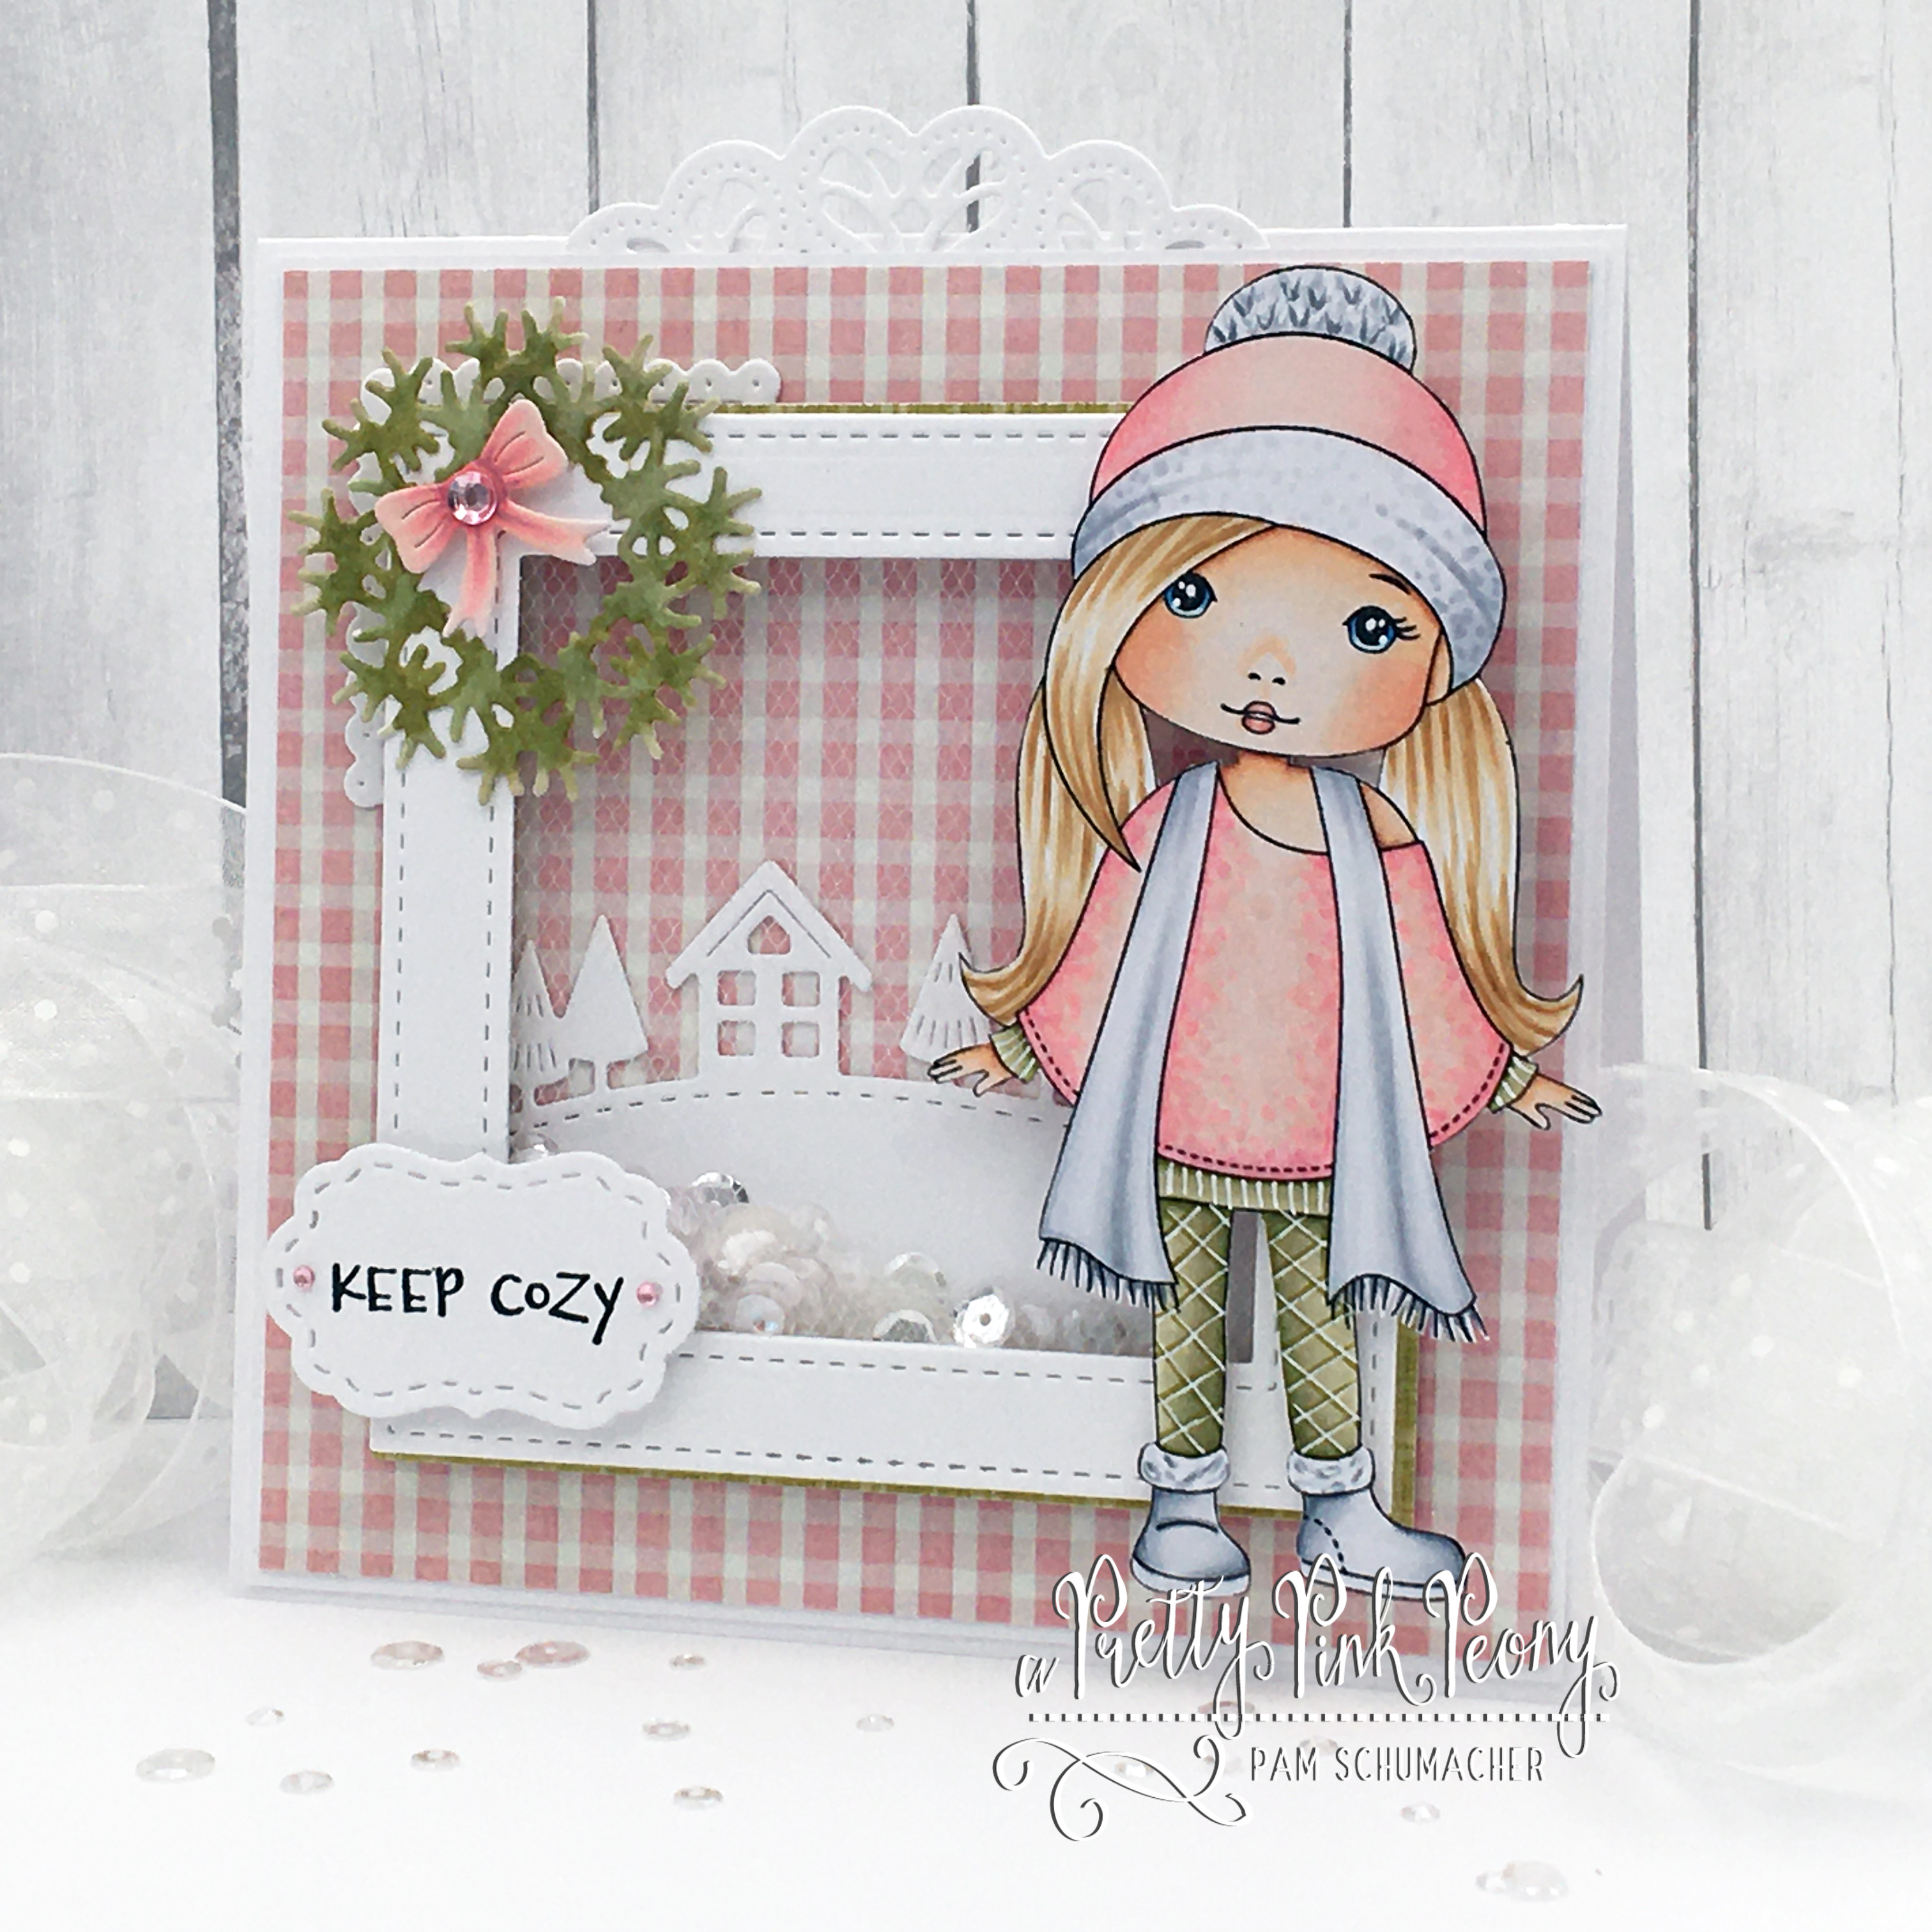 Keep Cozy2